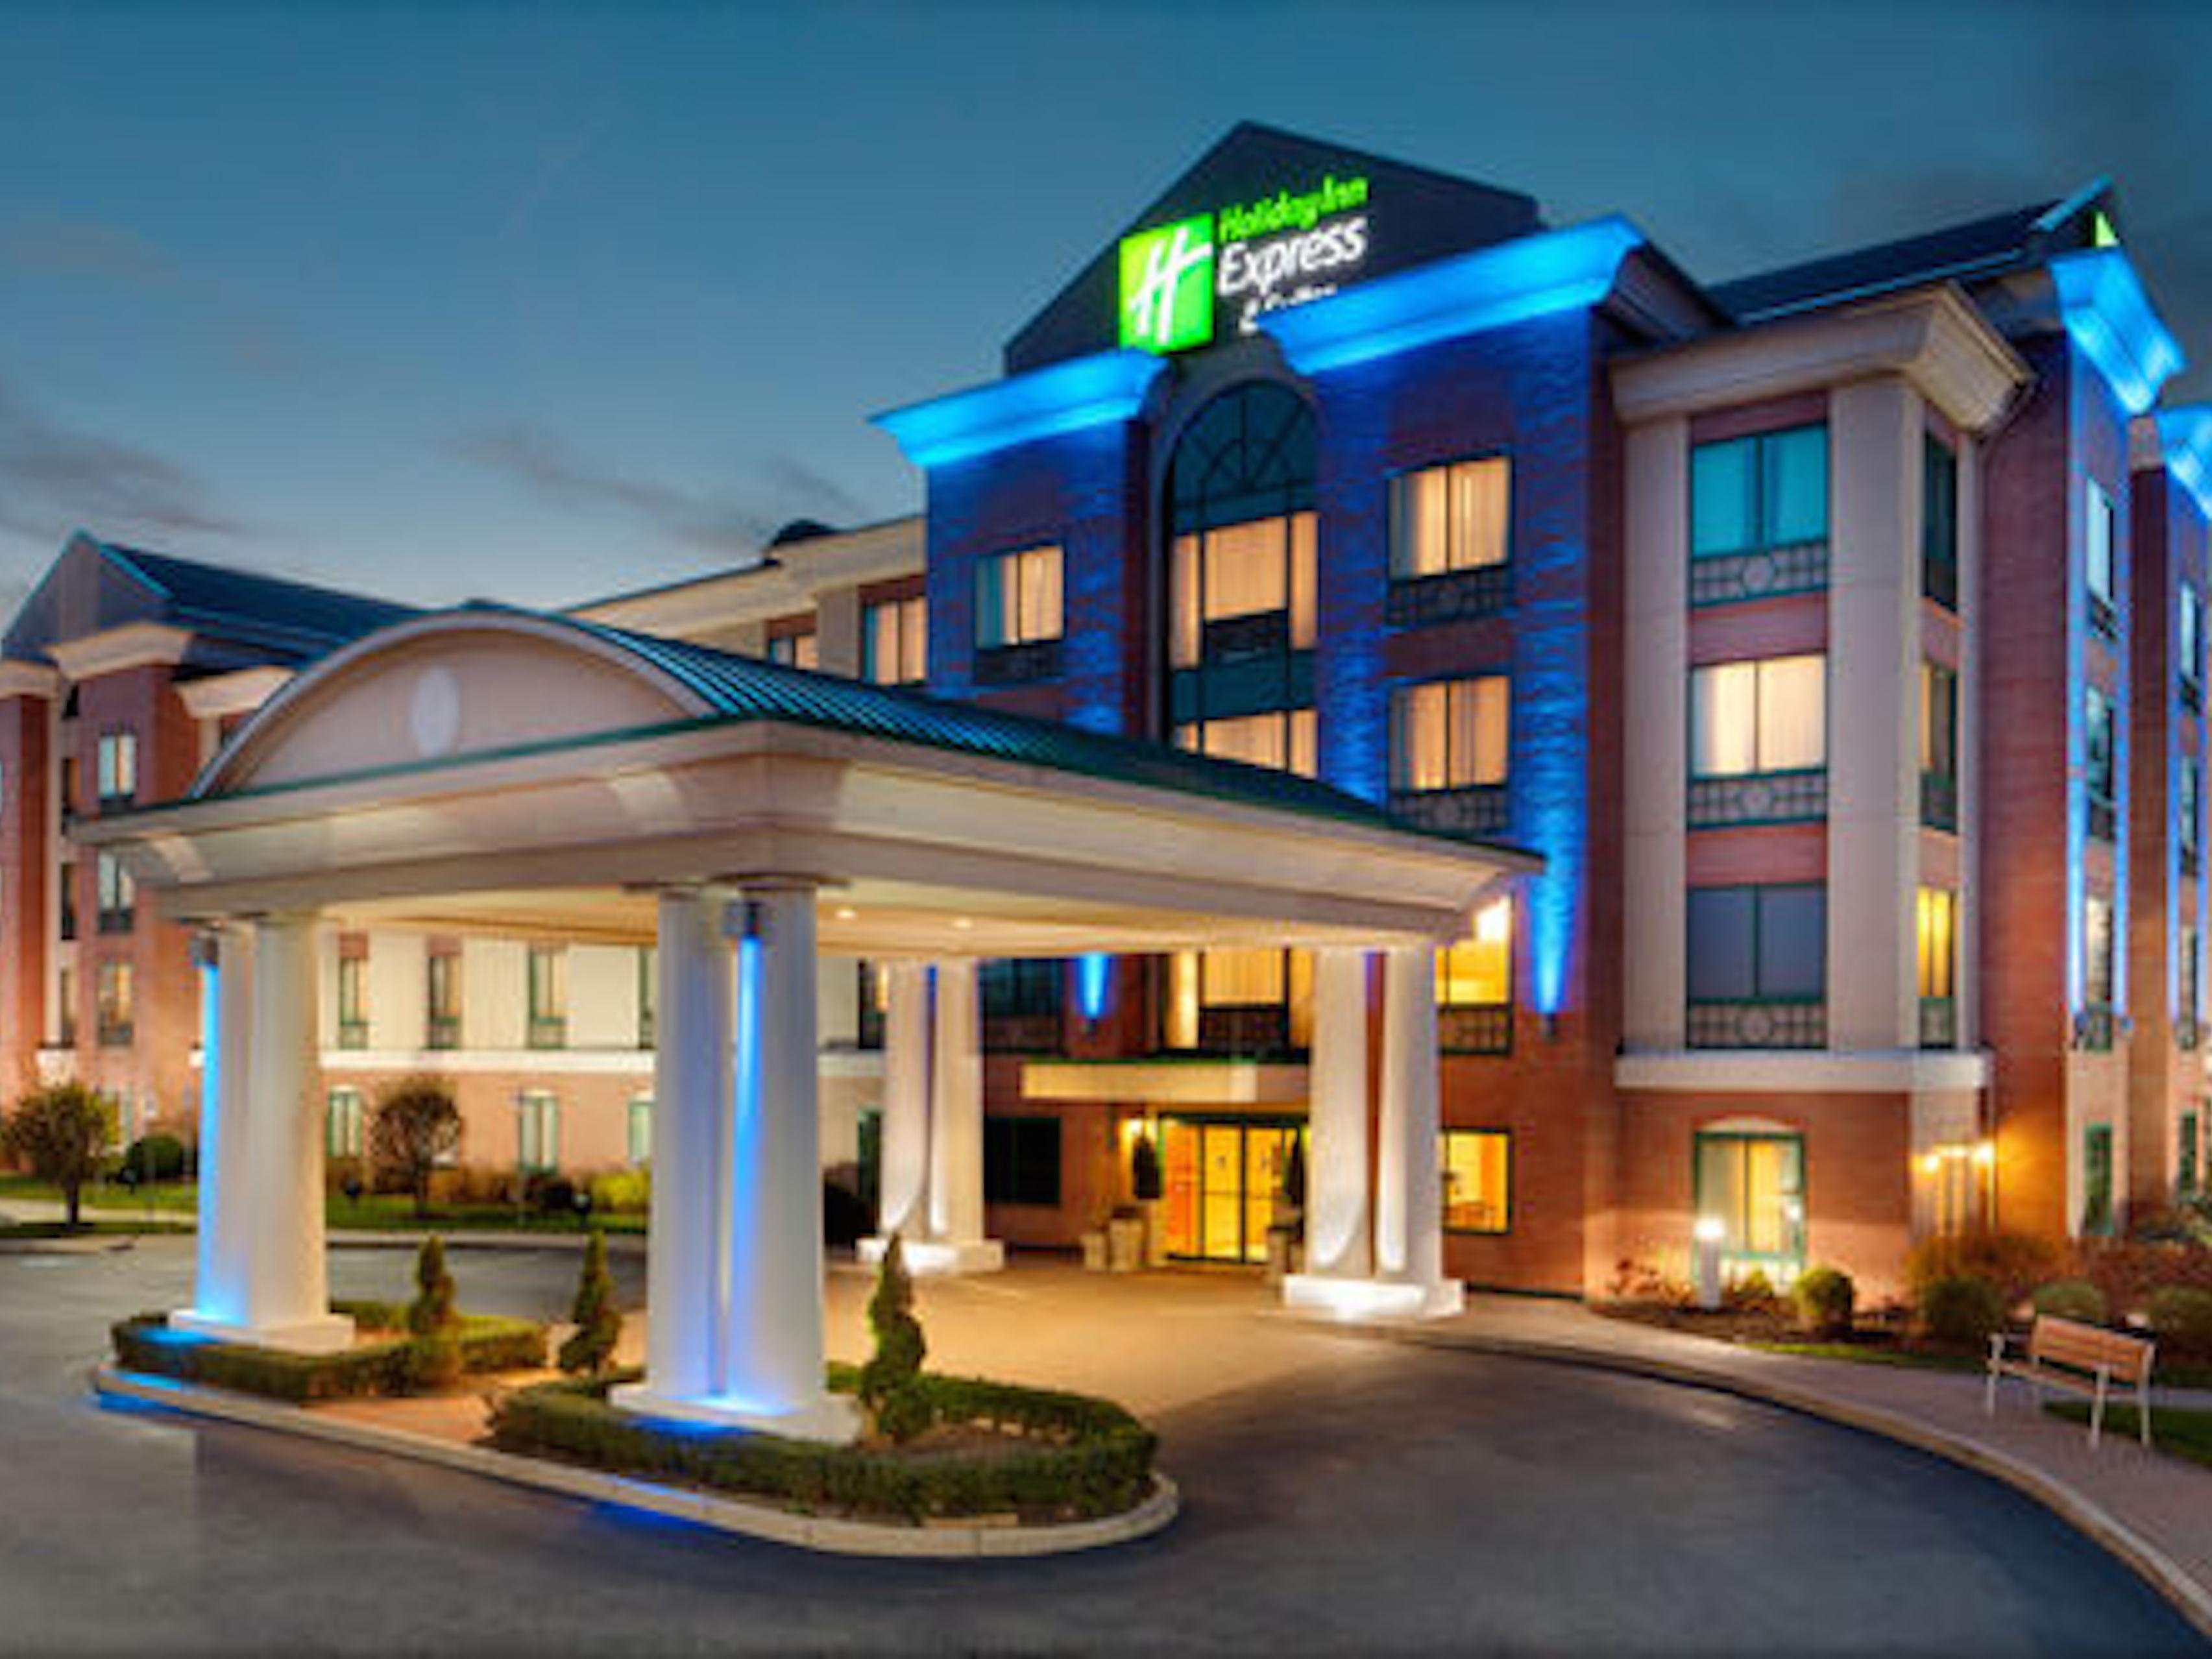 Holiday Inn Express & Suites Boynton Beach East Hotel by IHG